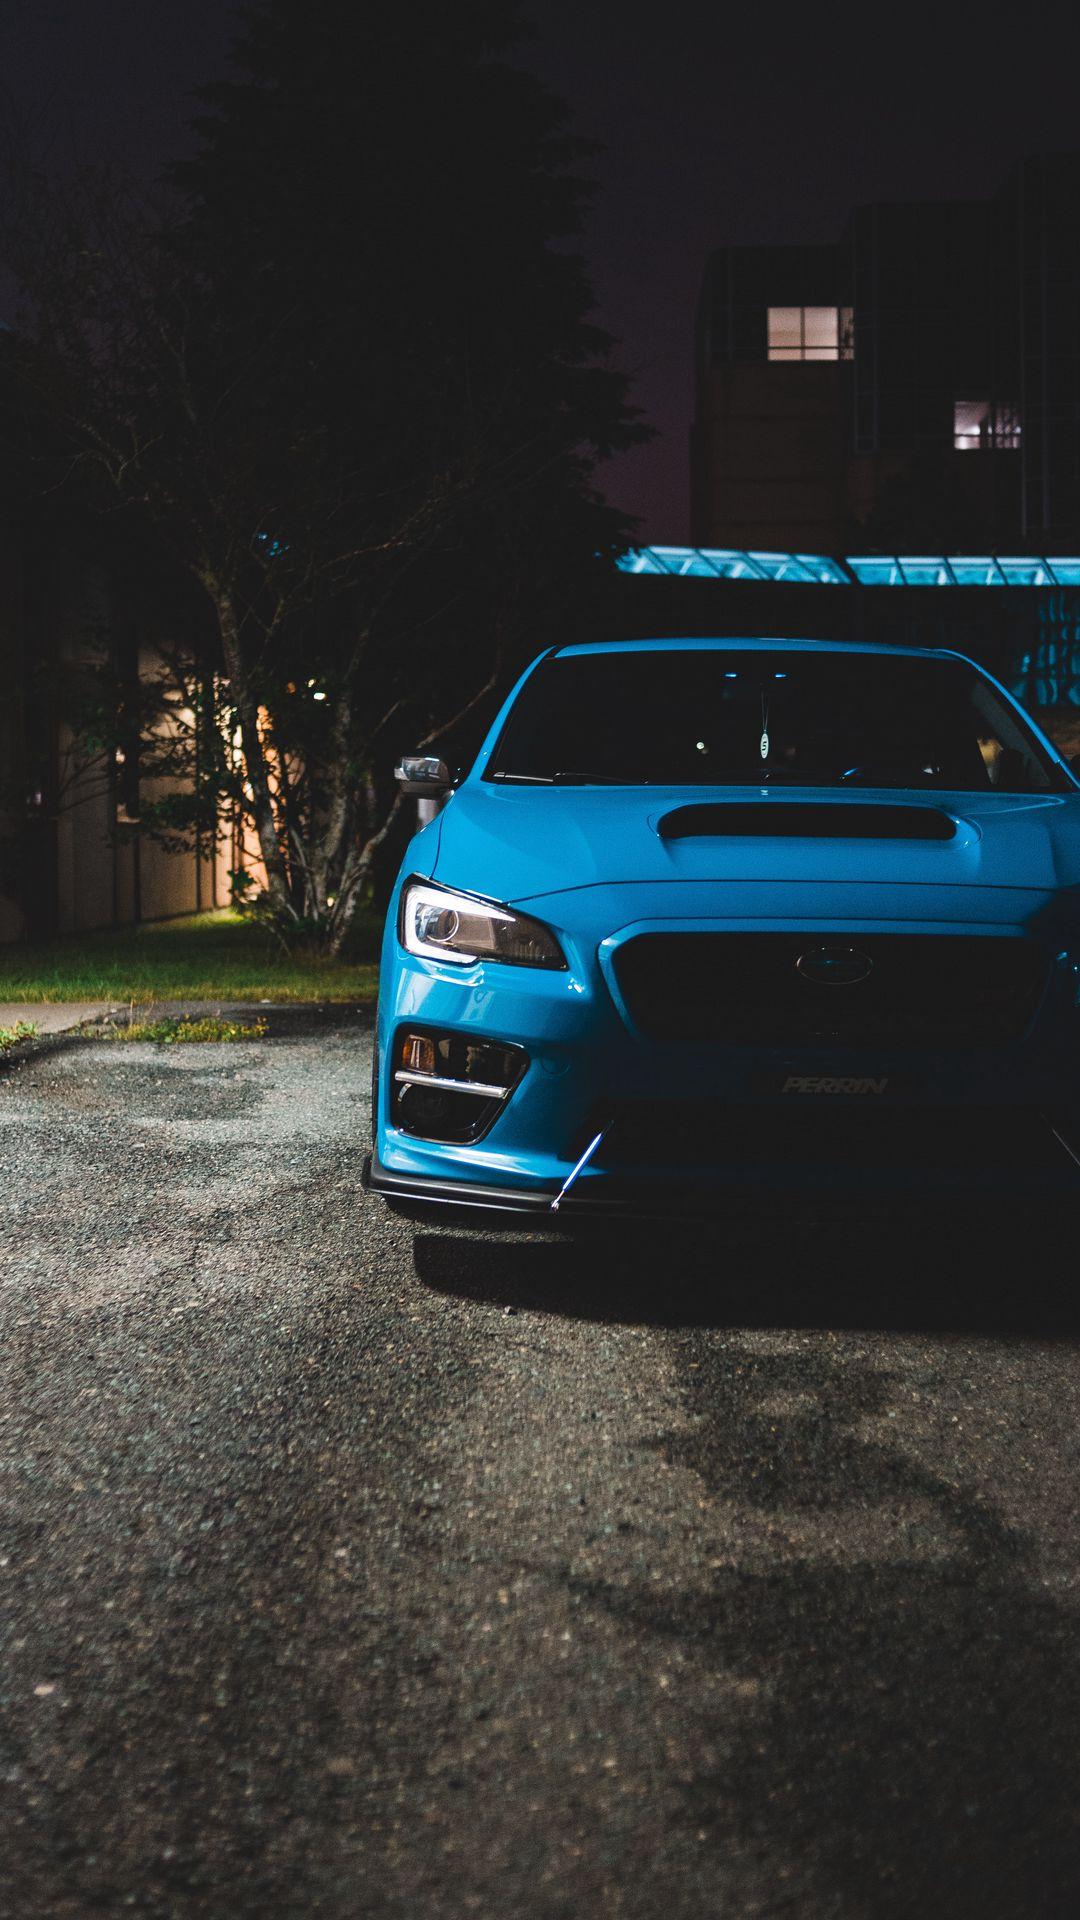 4K Ultra HD Subaru Brz Car HD Wallpapers Free Download